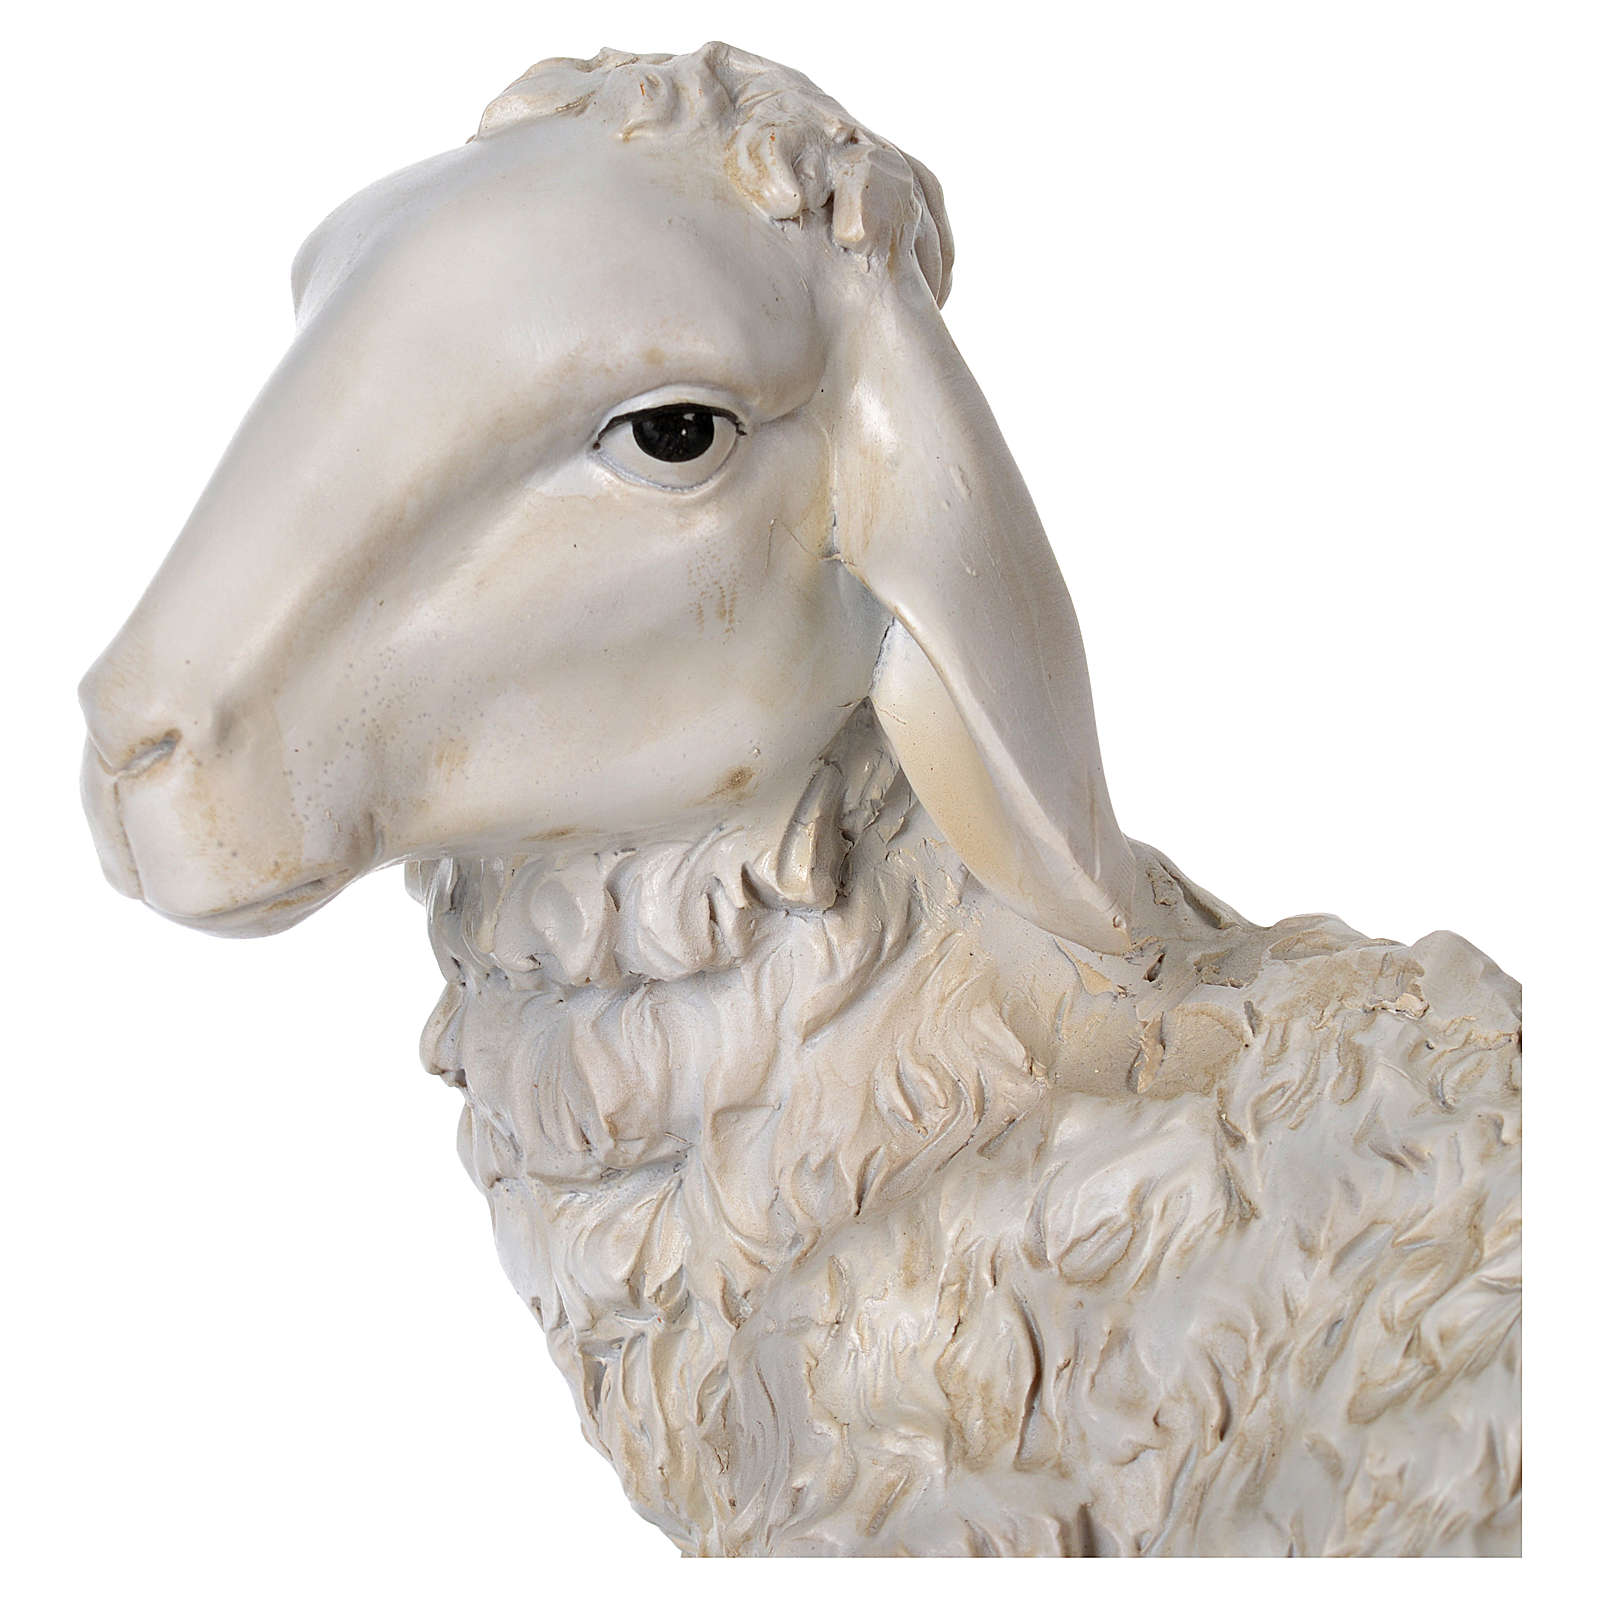 Resin Nativity Scene figurine, sitting sheep 50 - 60 cm 3